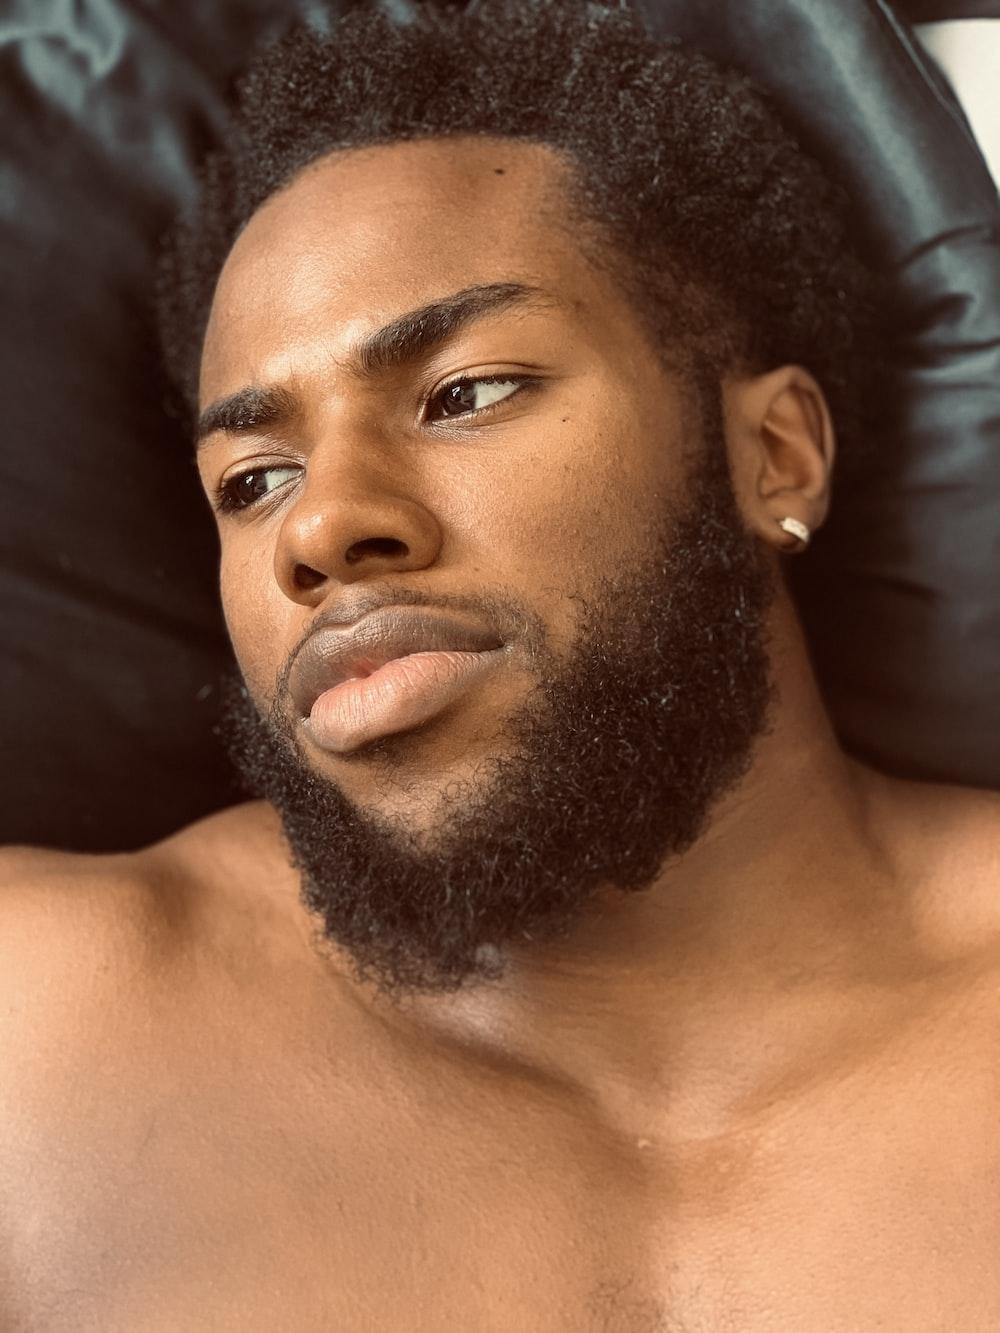 topless man lying on black textile